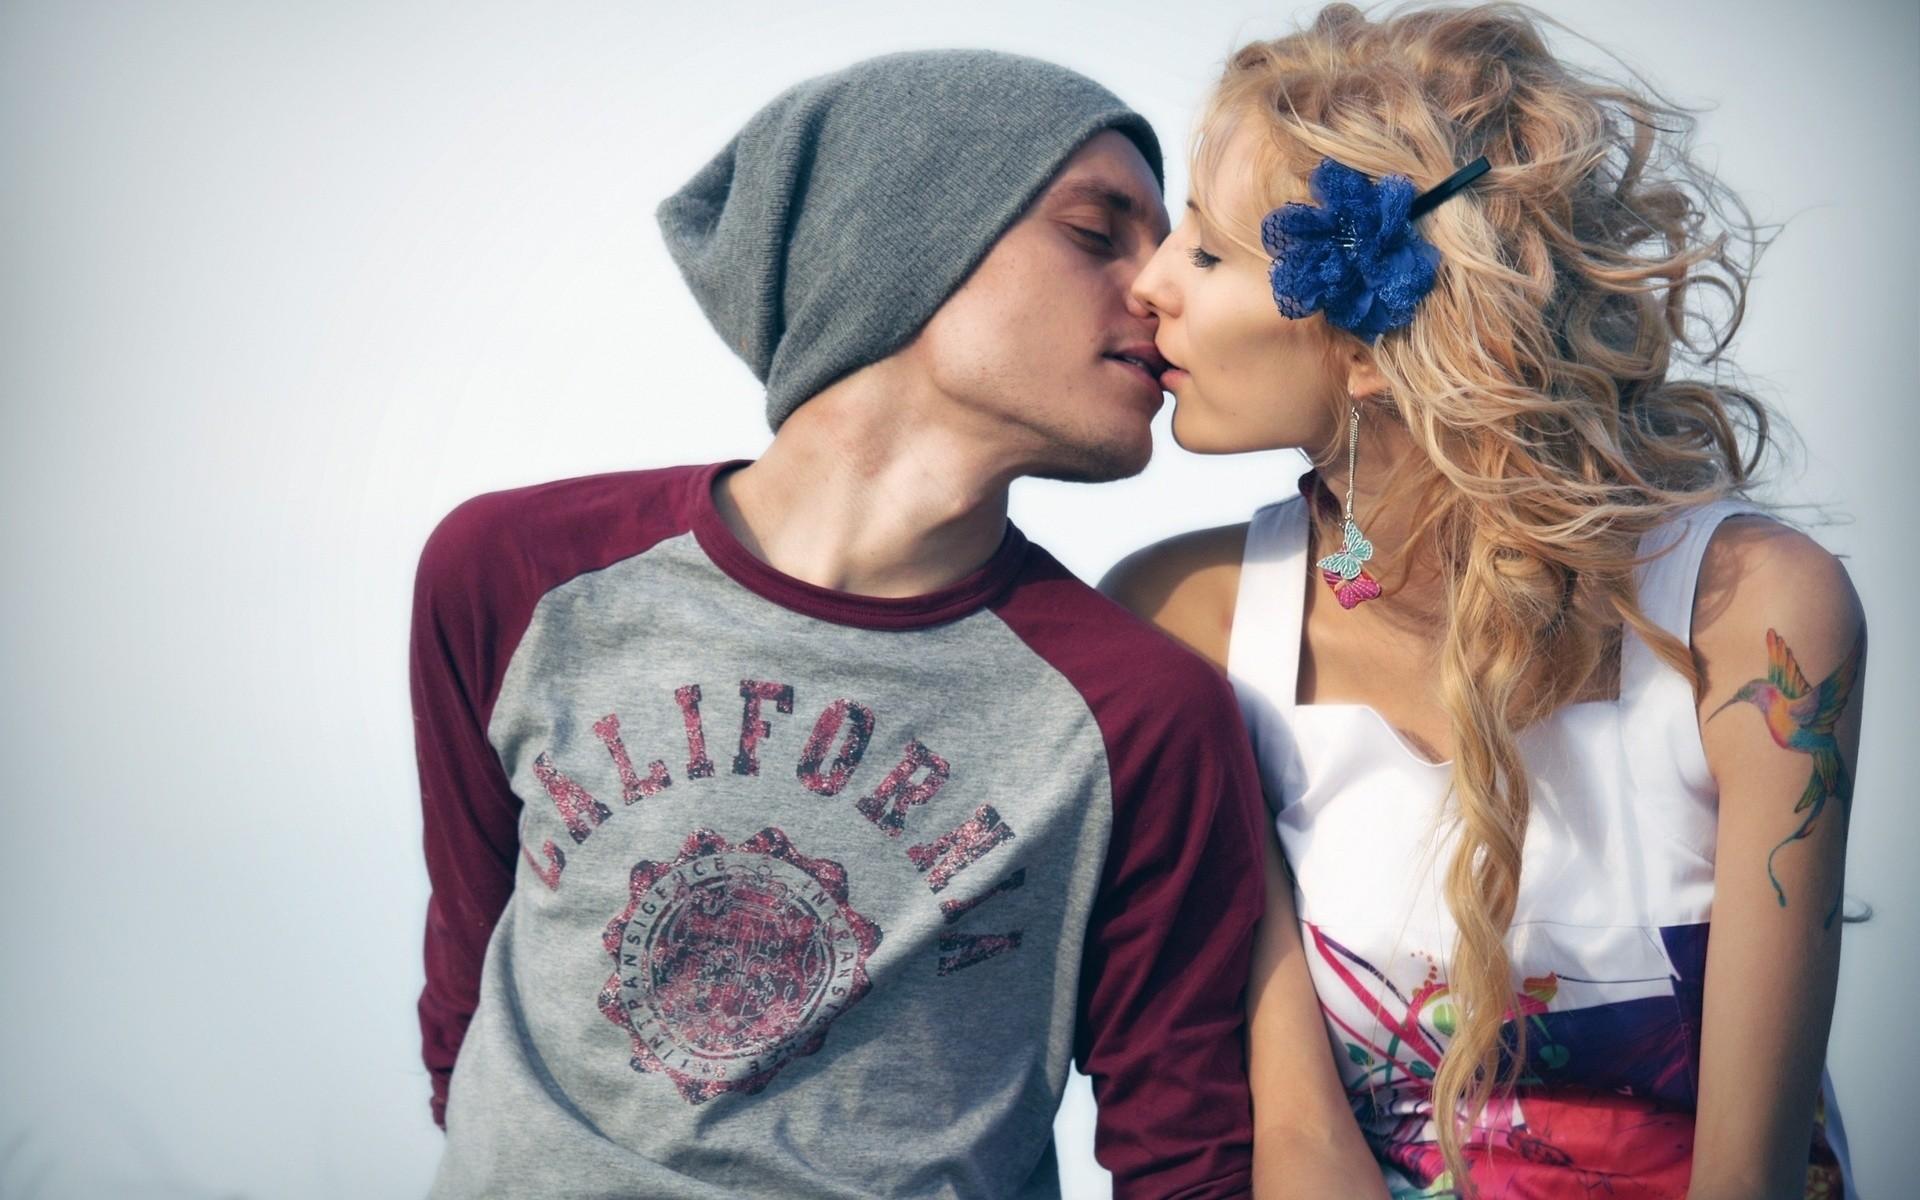 … Kissing Couple Wallpaper …